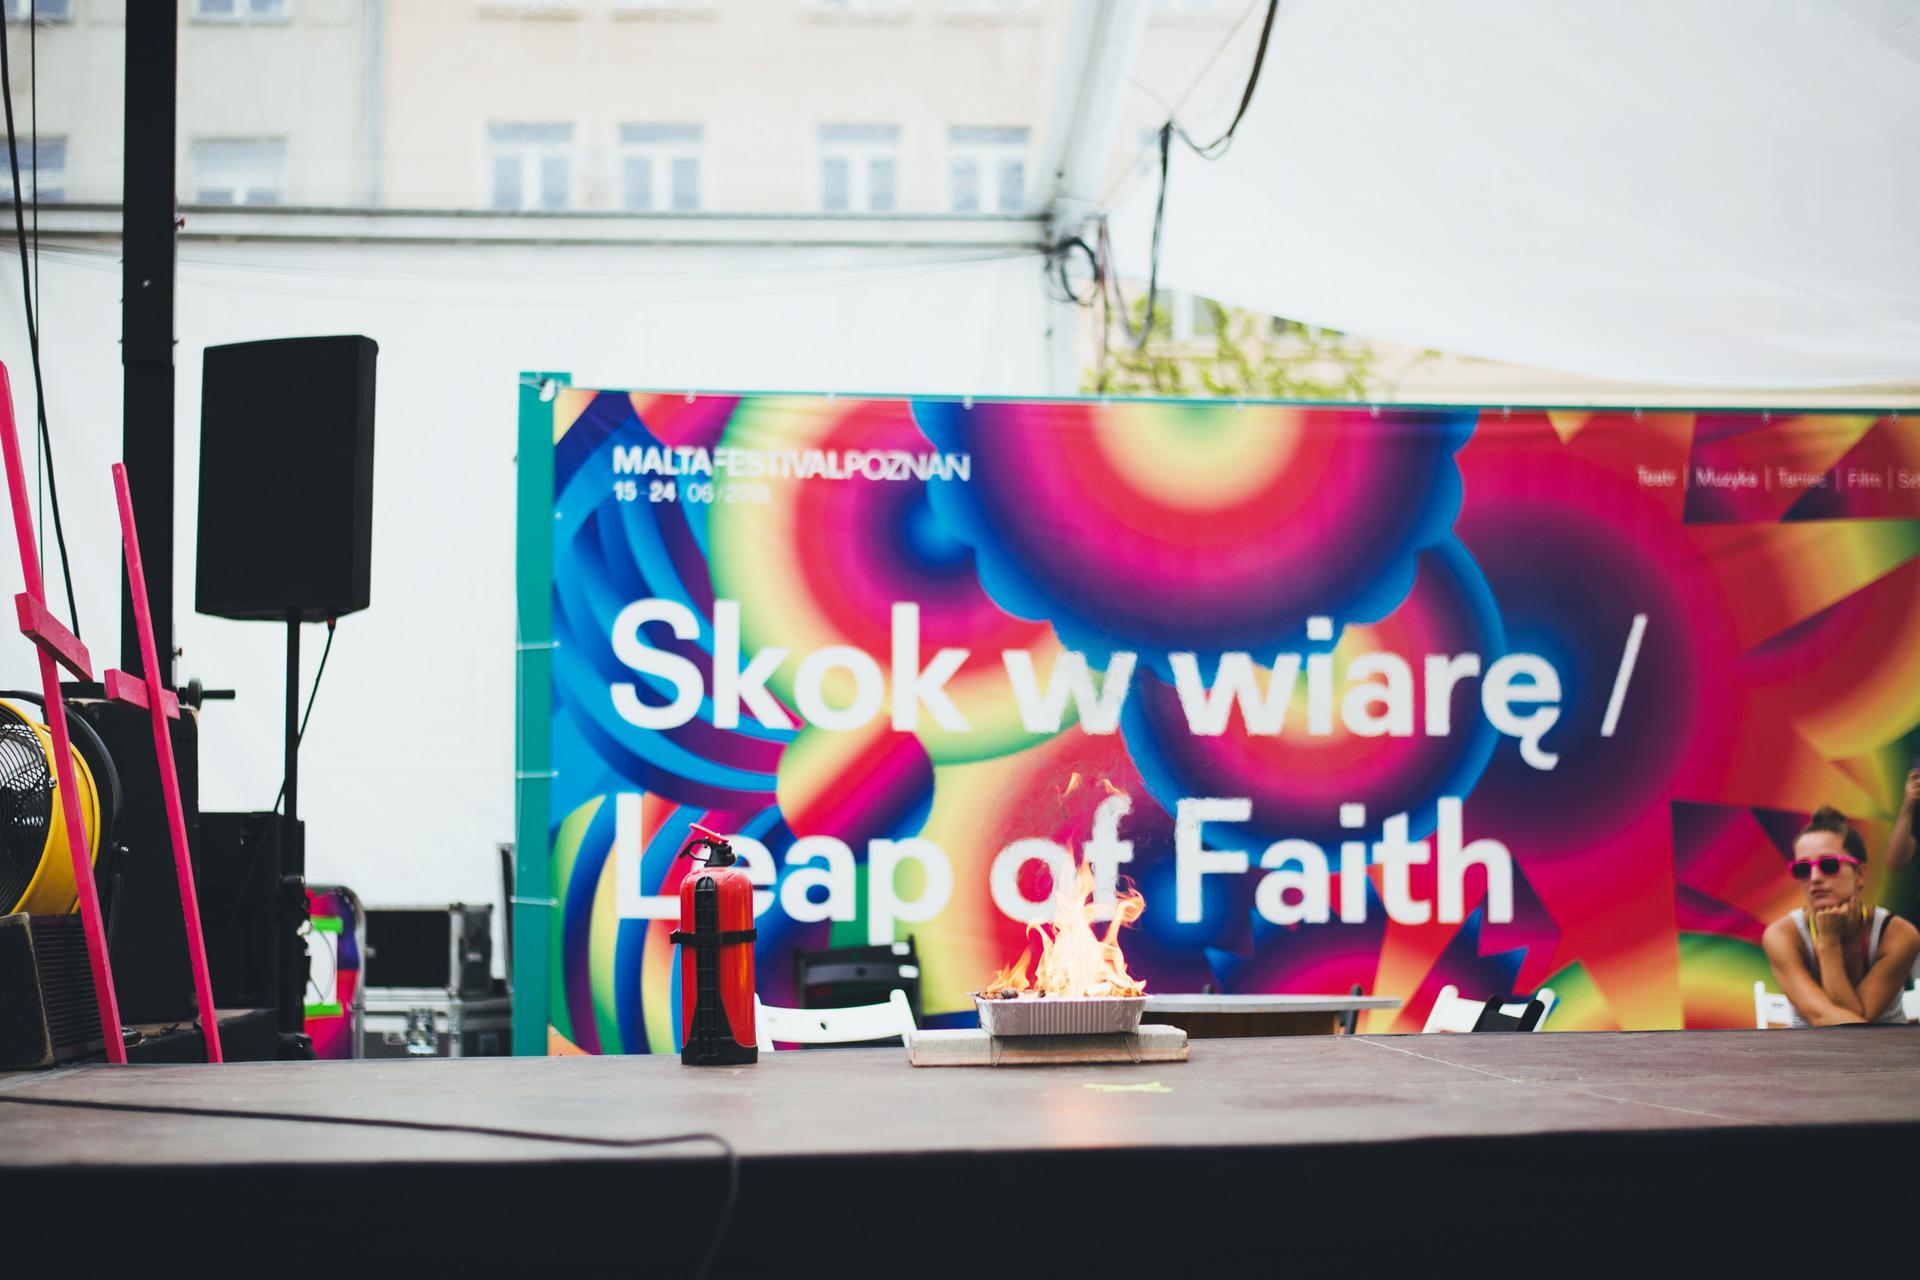 malta festiwal w poznaniu